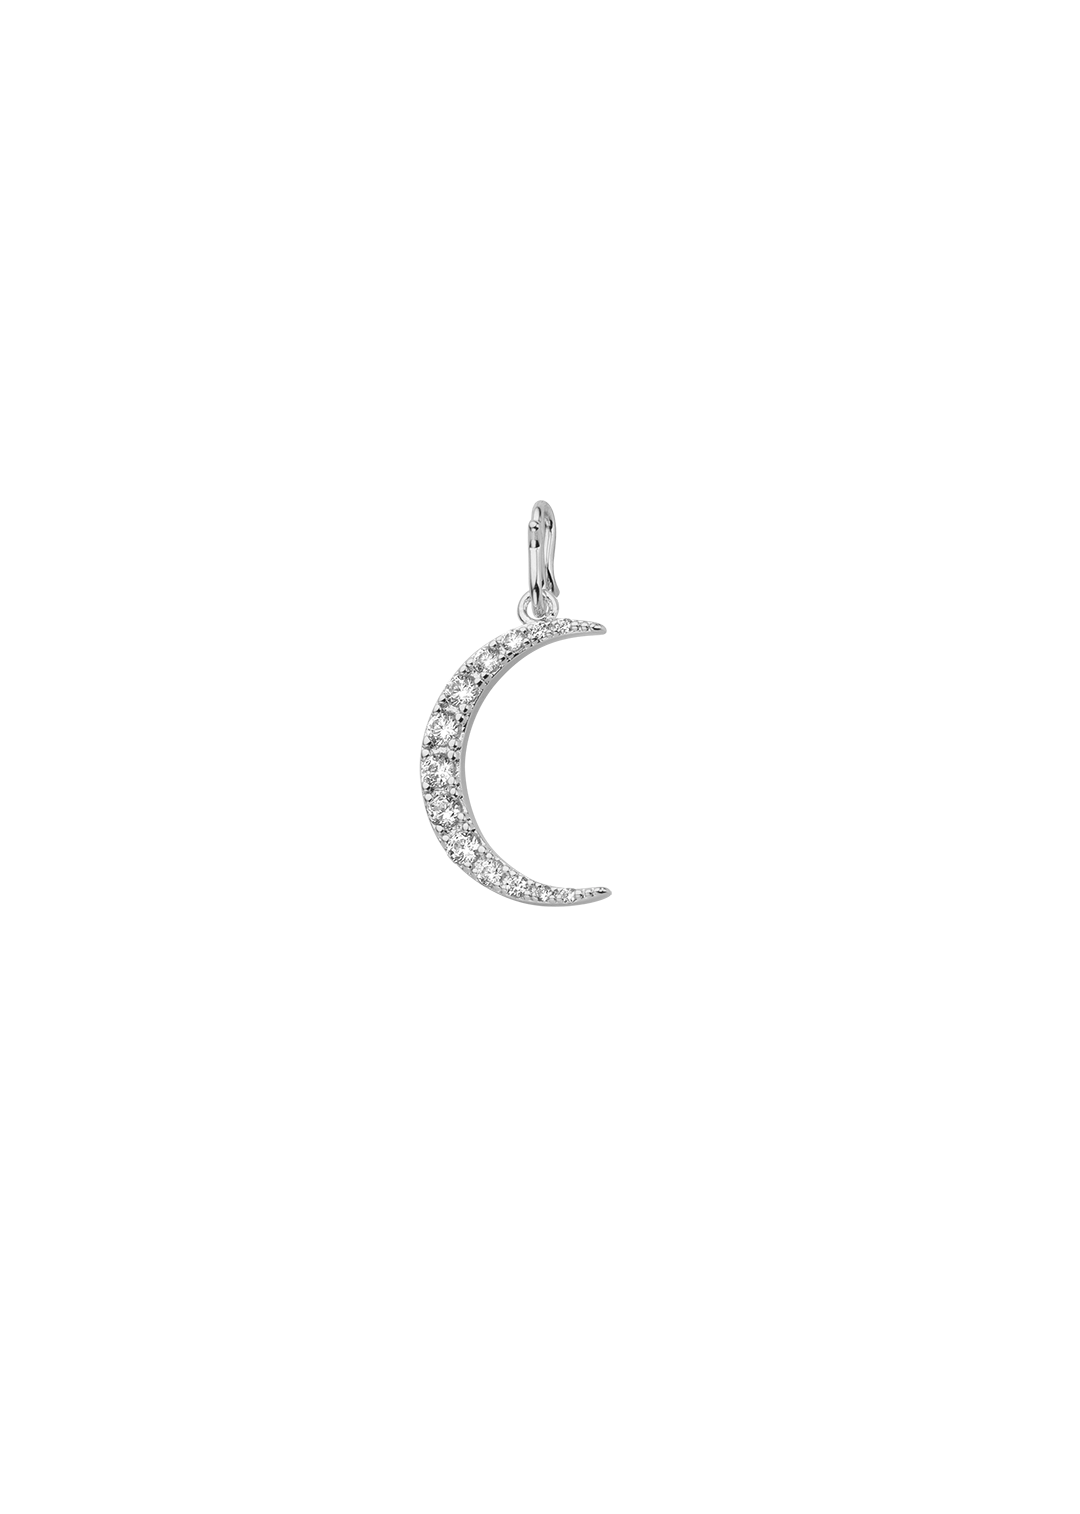 CHARMS_MYA_BAY_GRI_GRI_MOON_ARGENT_25